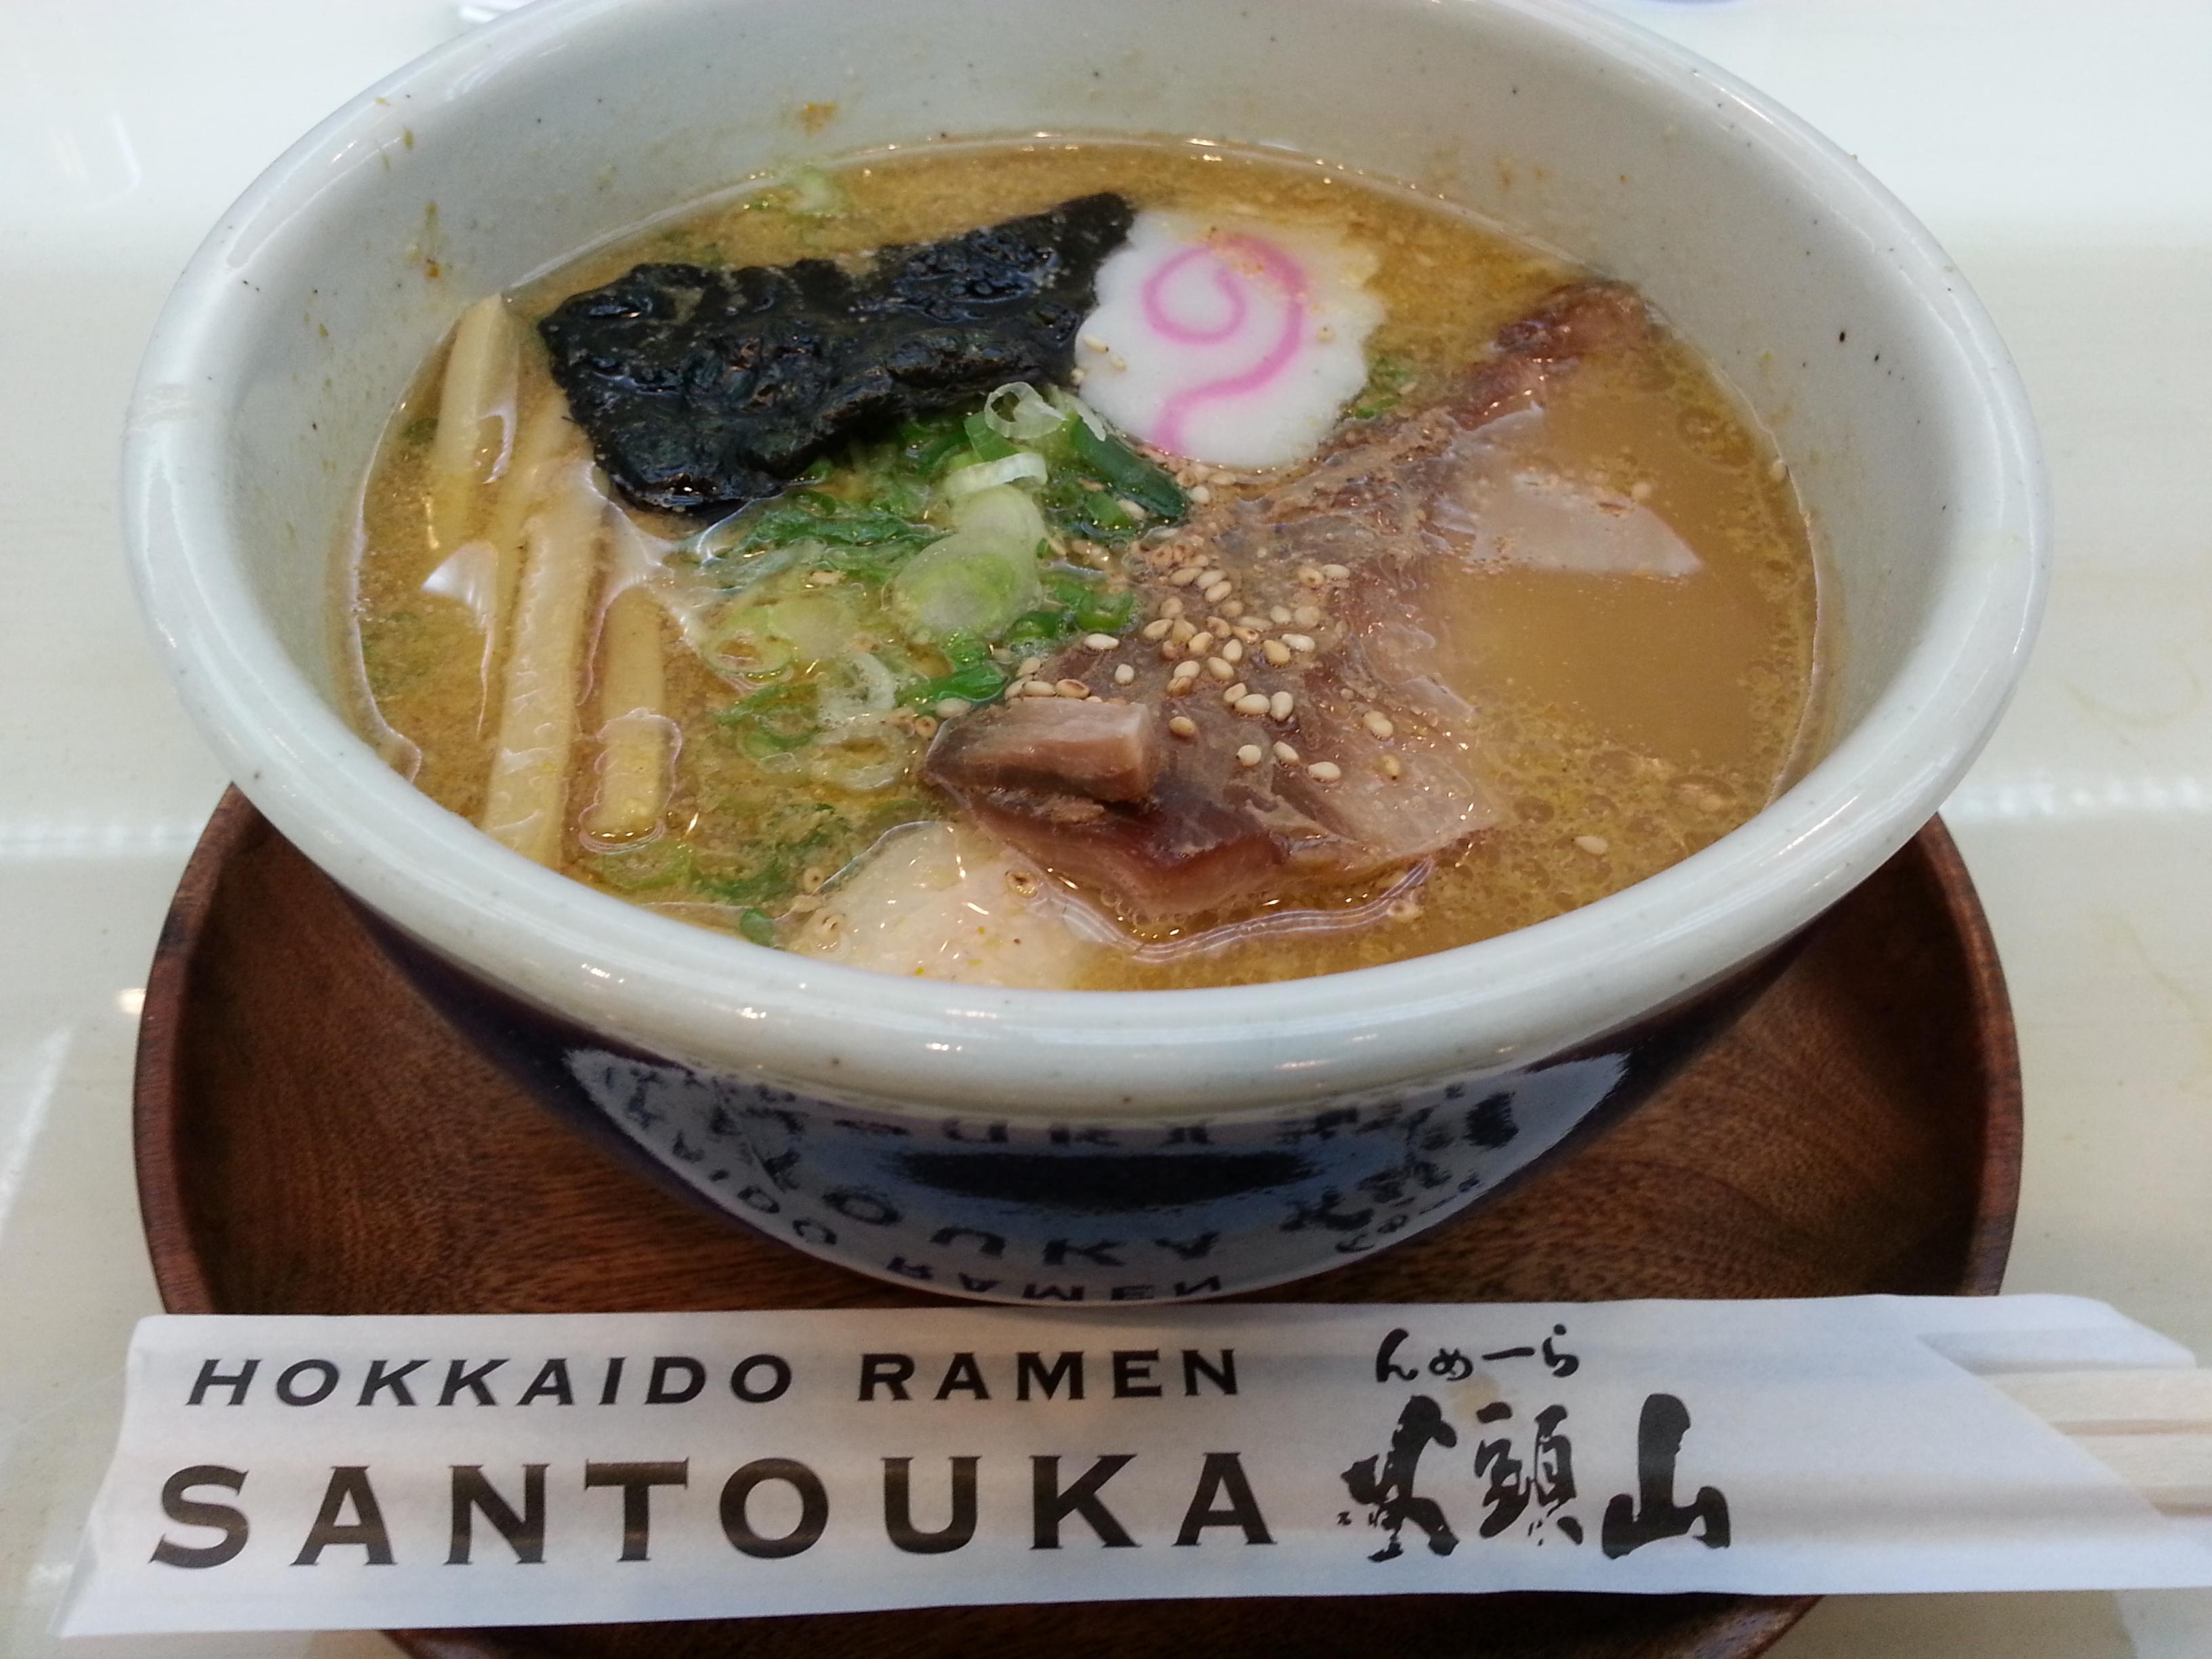 Hokkaido Ramen Santouka – Japan Style Ramen Opens Shop Outside Don Quijote